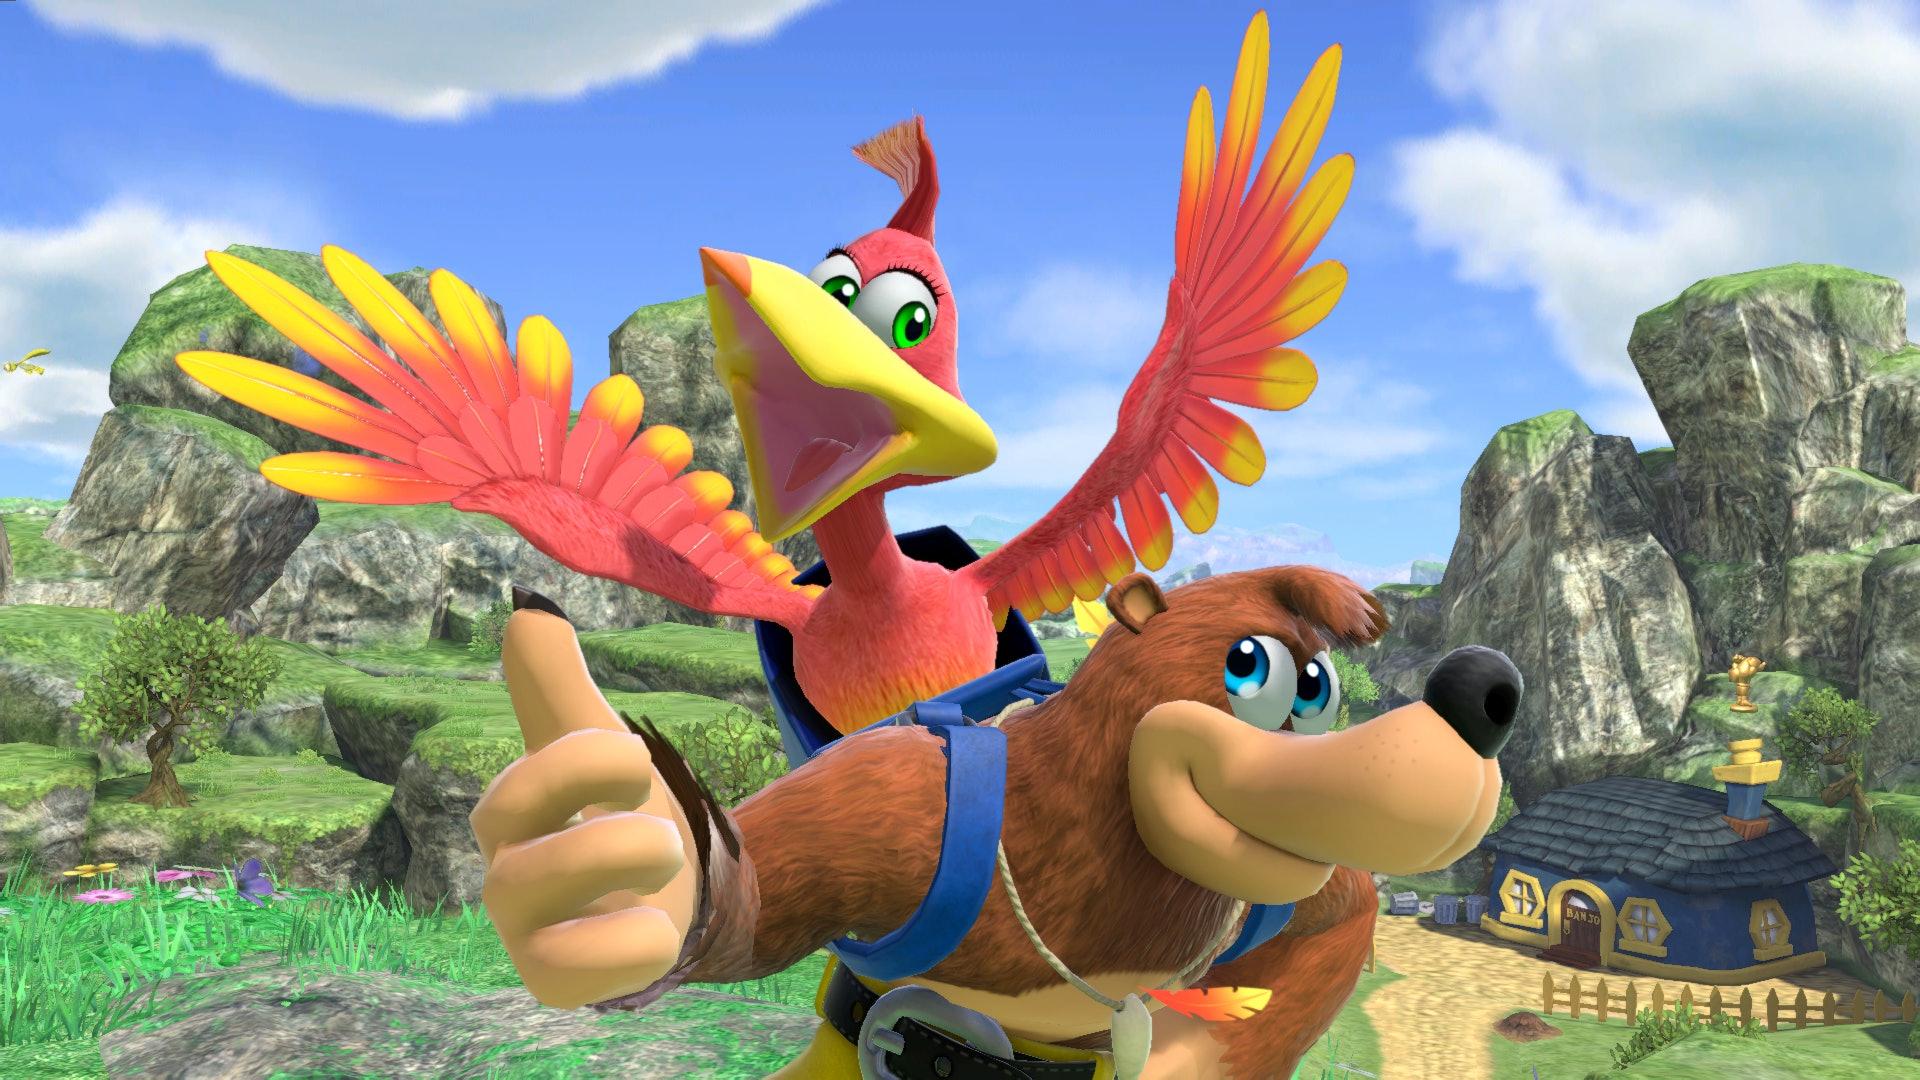 Super Smash Bros Ultimate Banjo and Kazooie